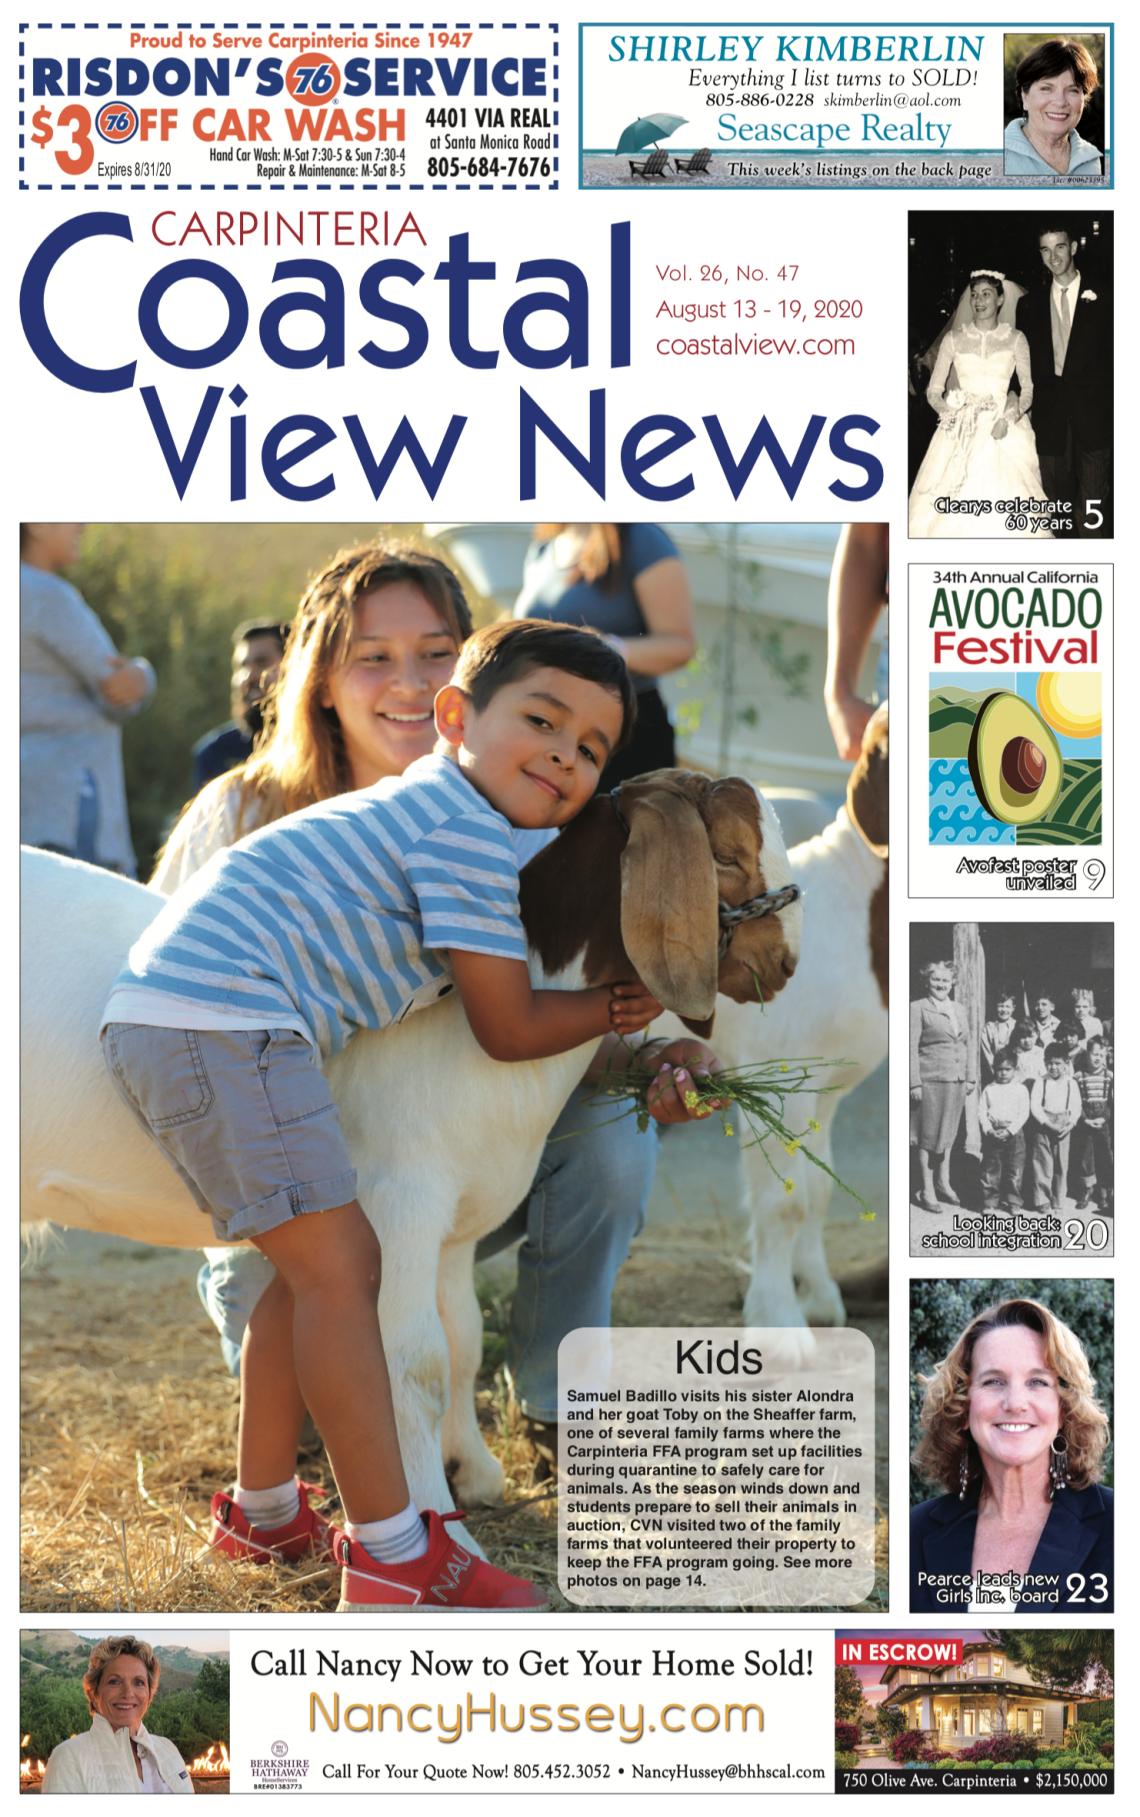 Coastal View News • August 13, 2020